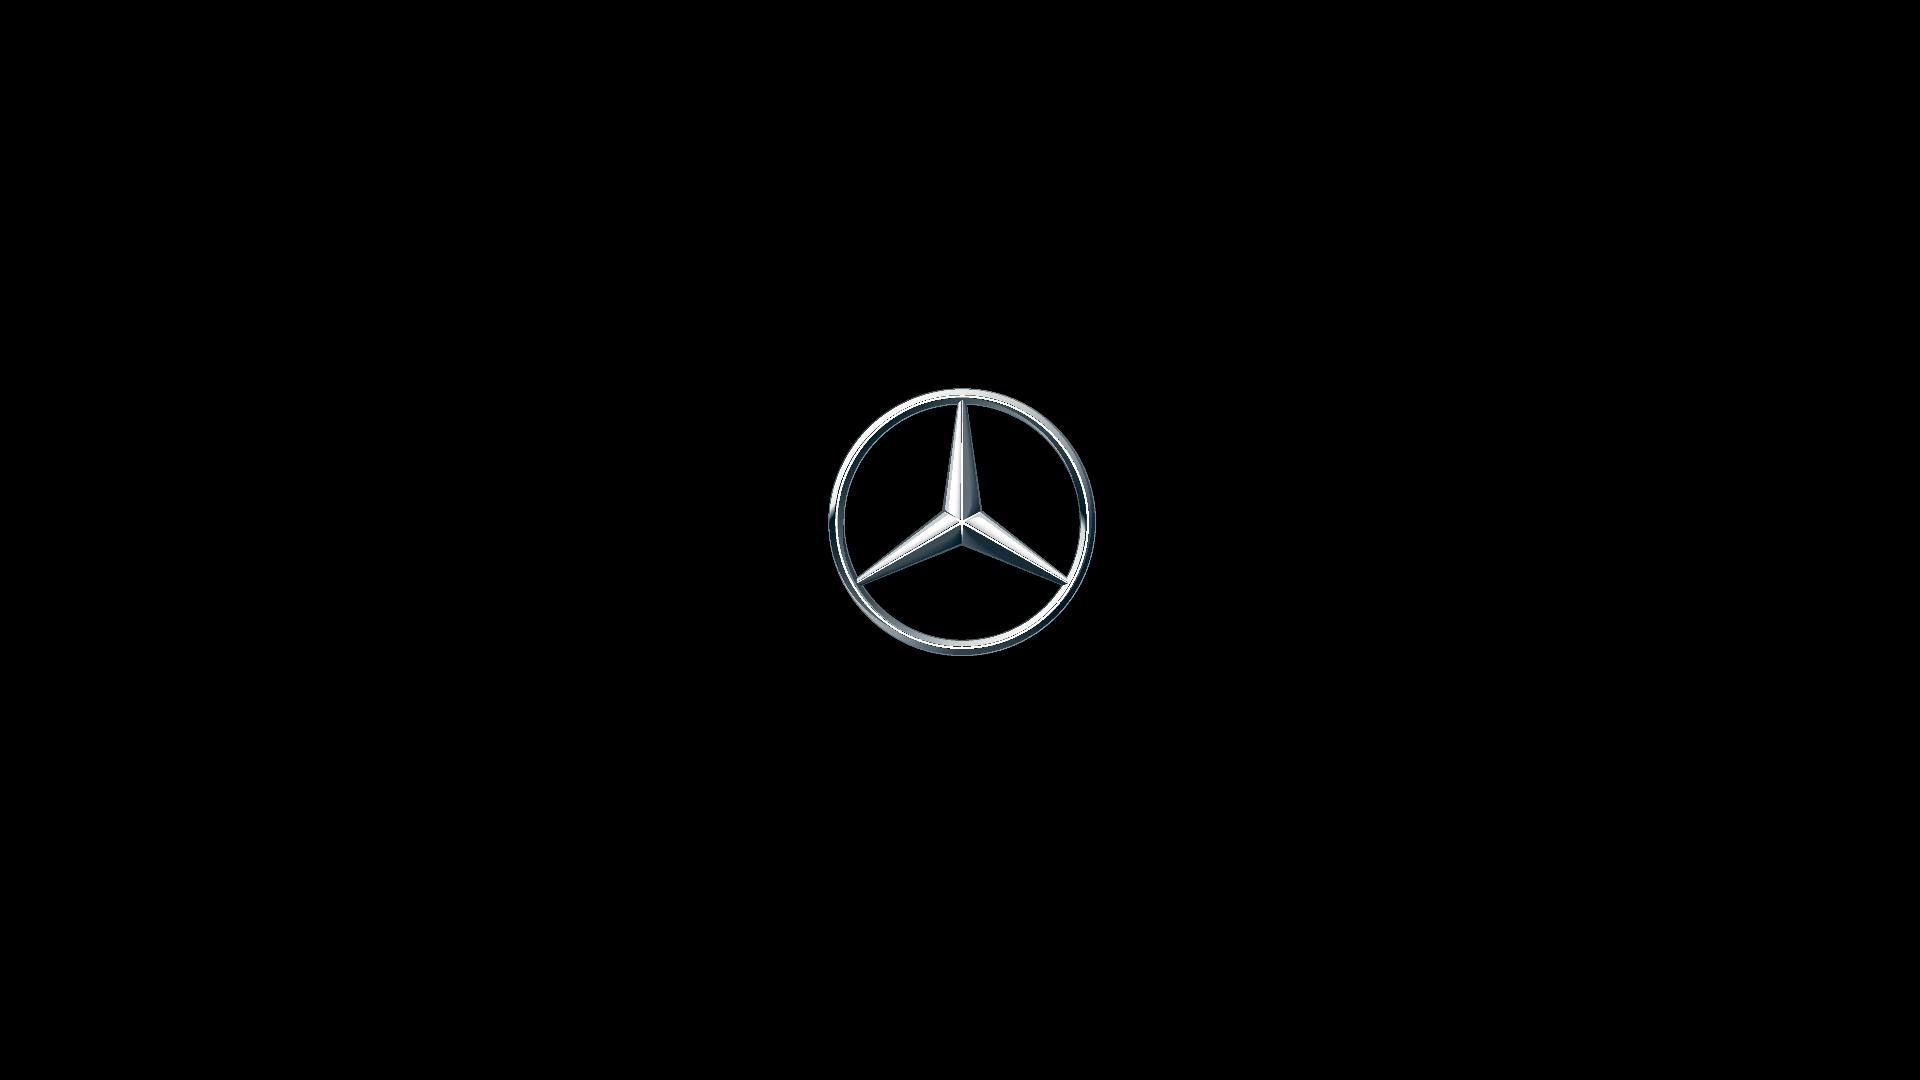 Mercedes Benz Logo Wallpaper HD Full HD Pictures 1920x1080